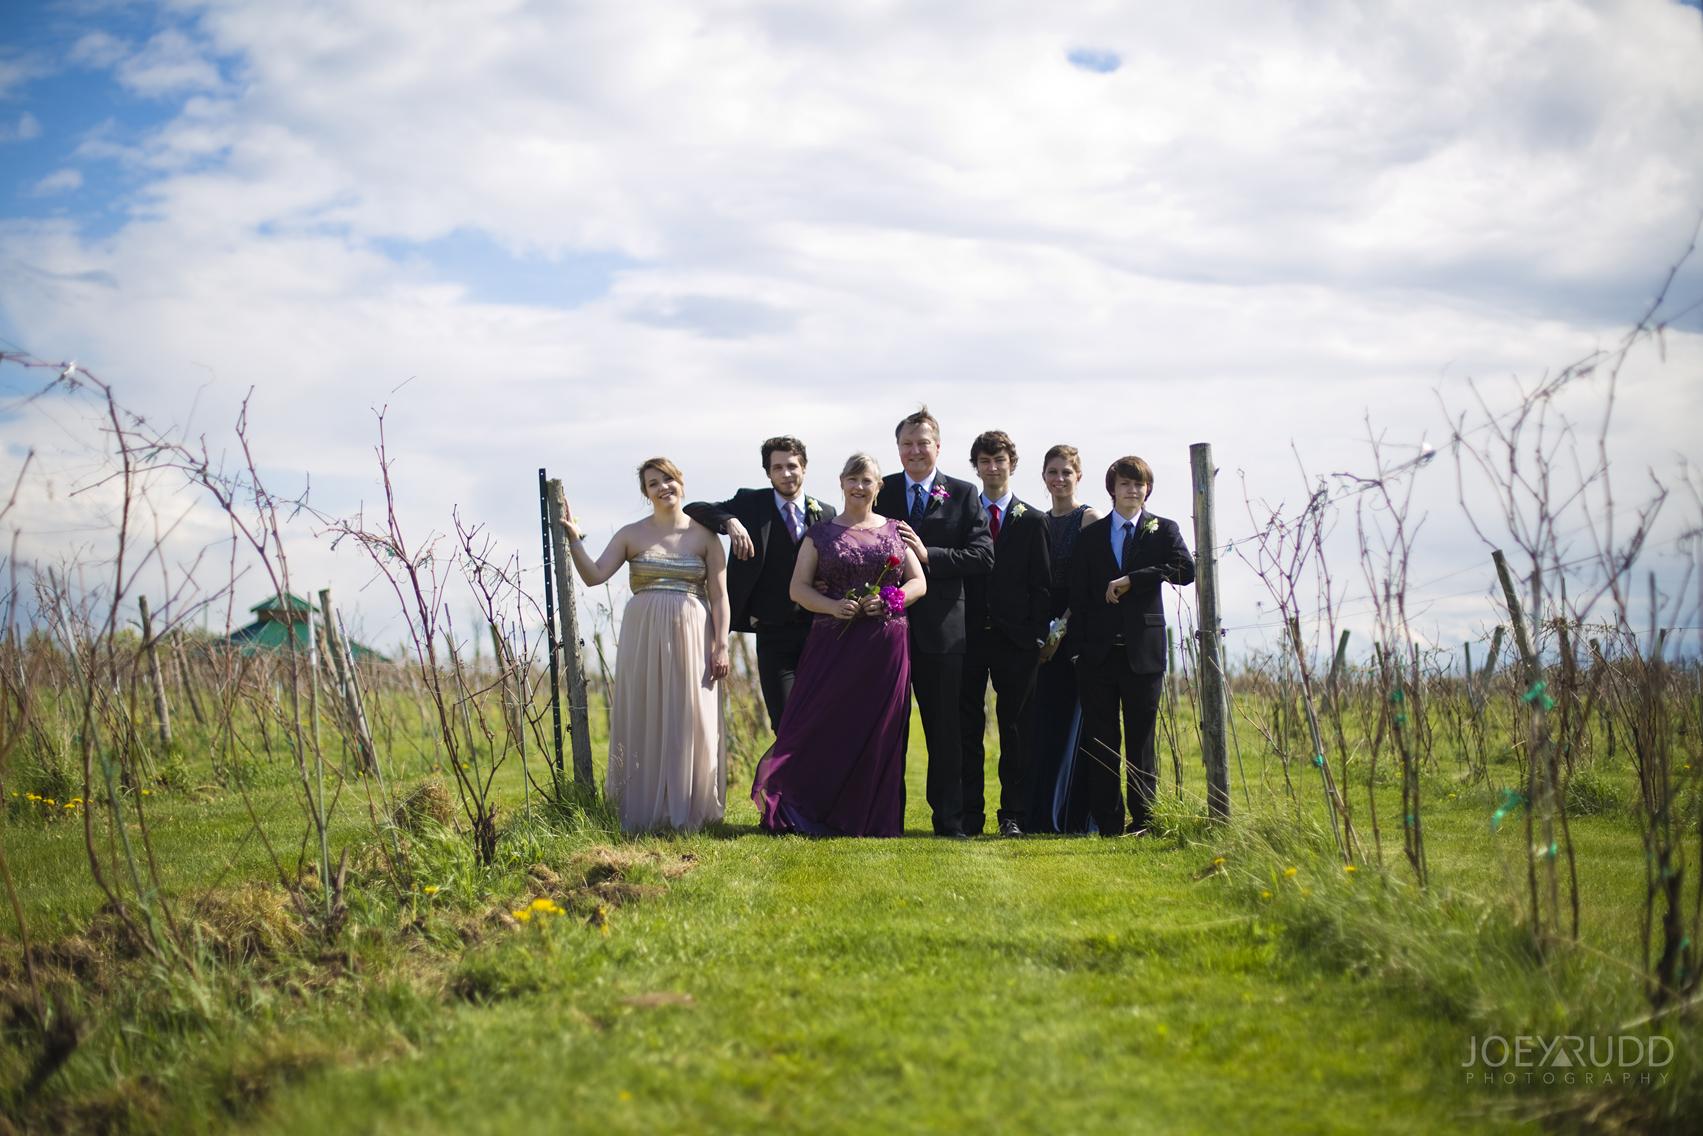 Elopement Session at Jabulani Vineyard by Joey Rudd Photography Ottawa Wedding Photographer Family Shot Winery